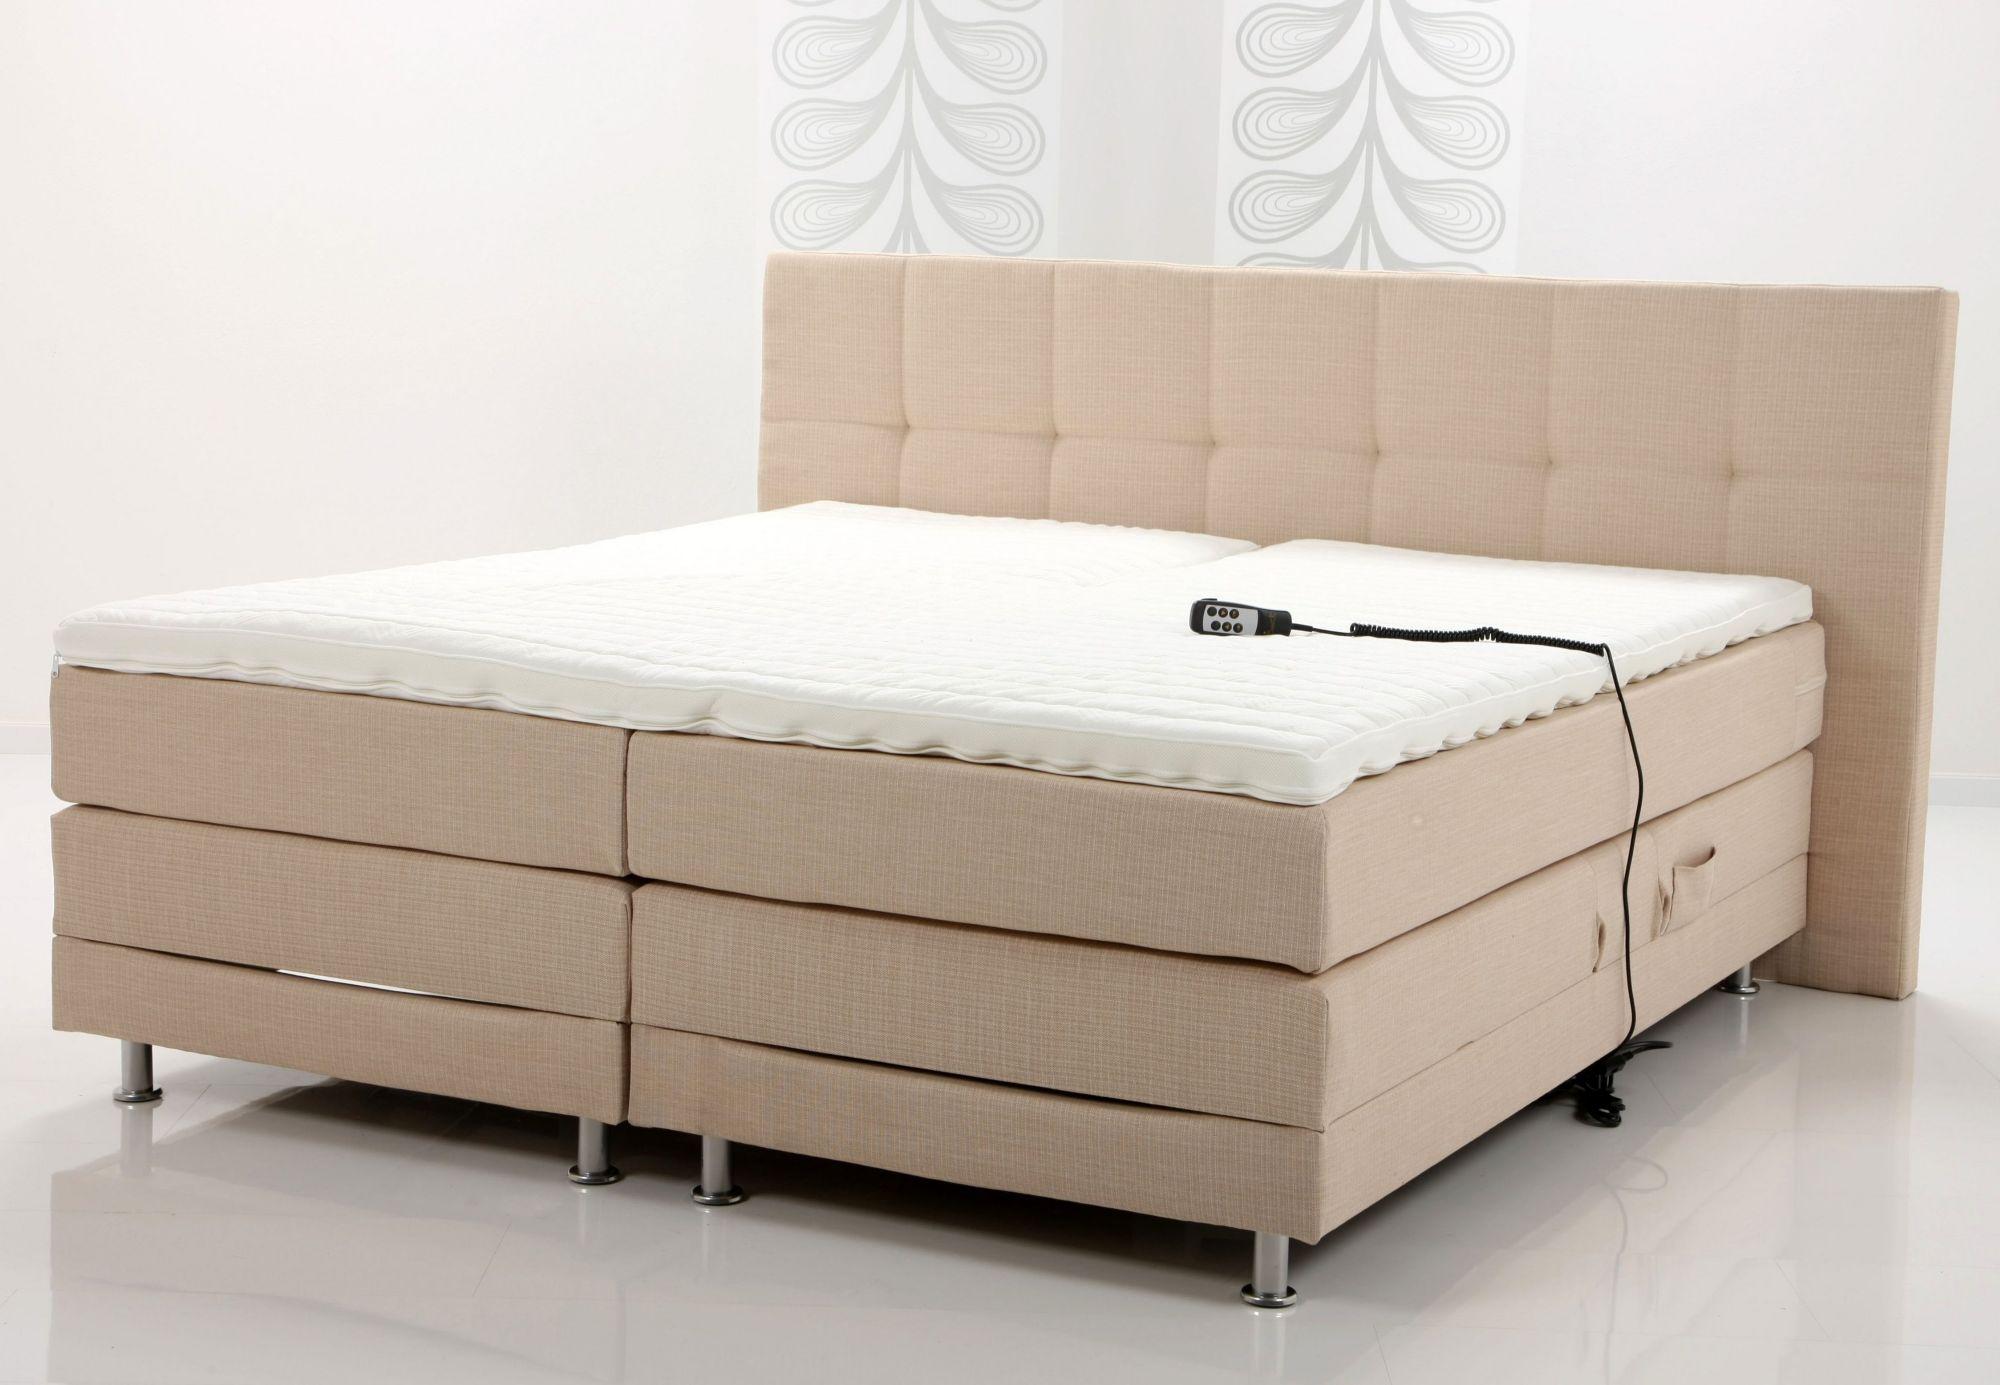 boxspringbett mit elektromotor breckle made in germany schwab versand k chenzeilen. Black Bedroom Furniture Sets. Home Design Ideas